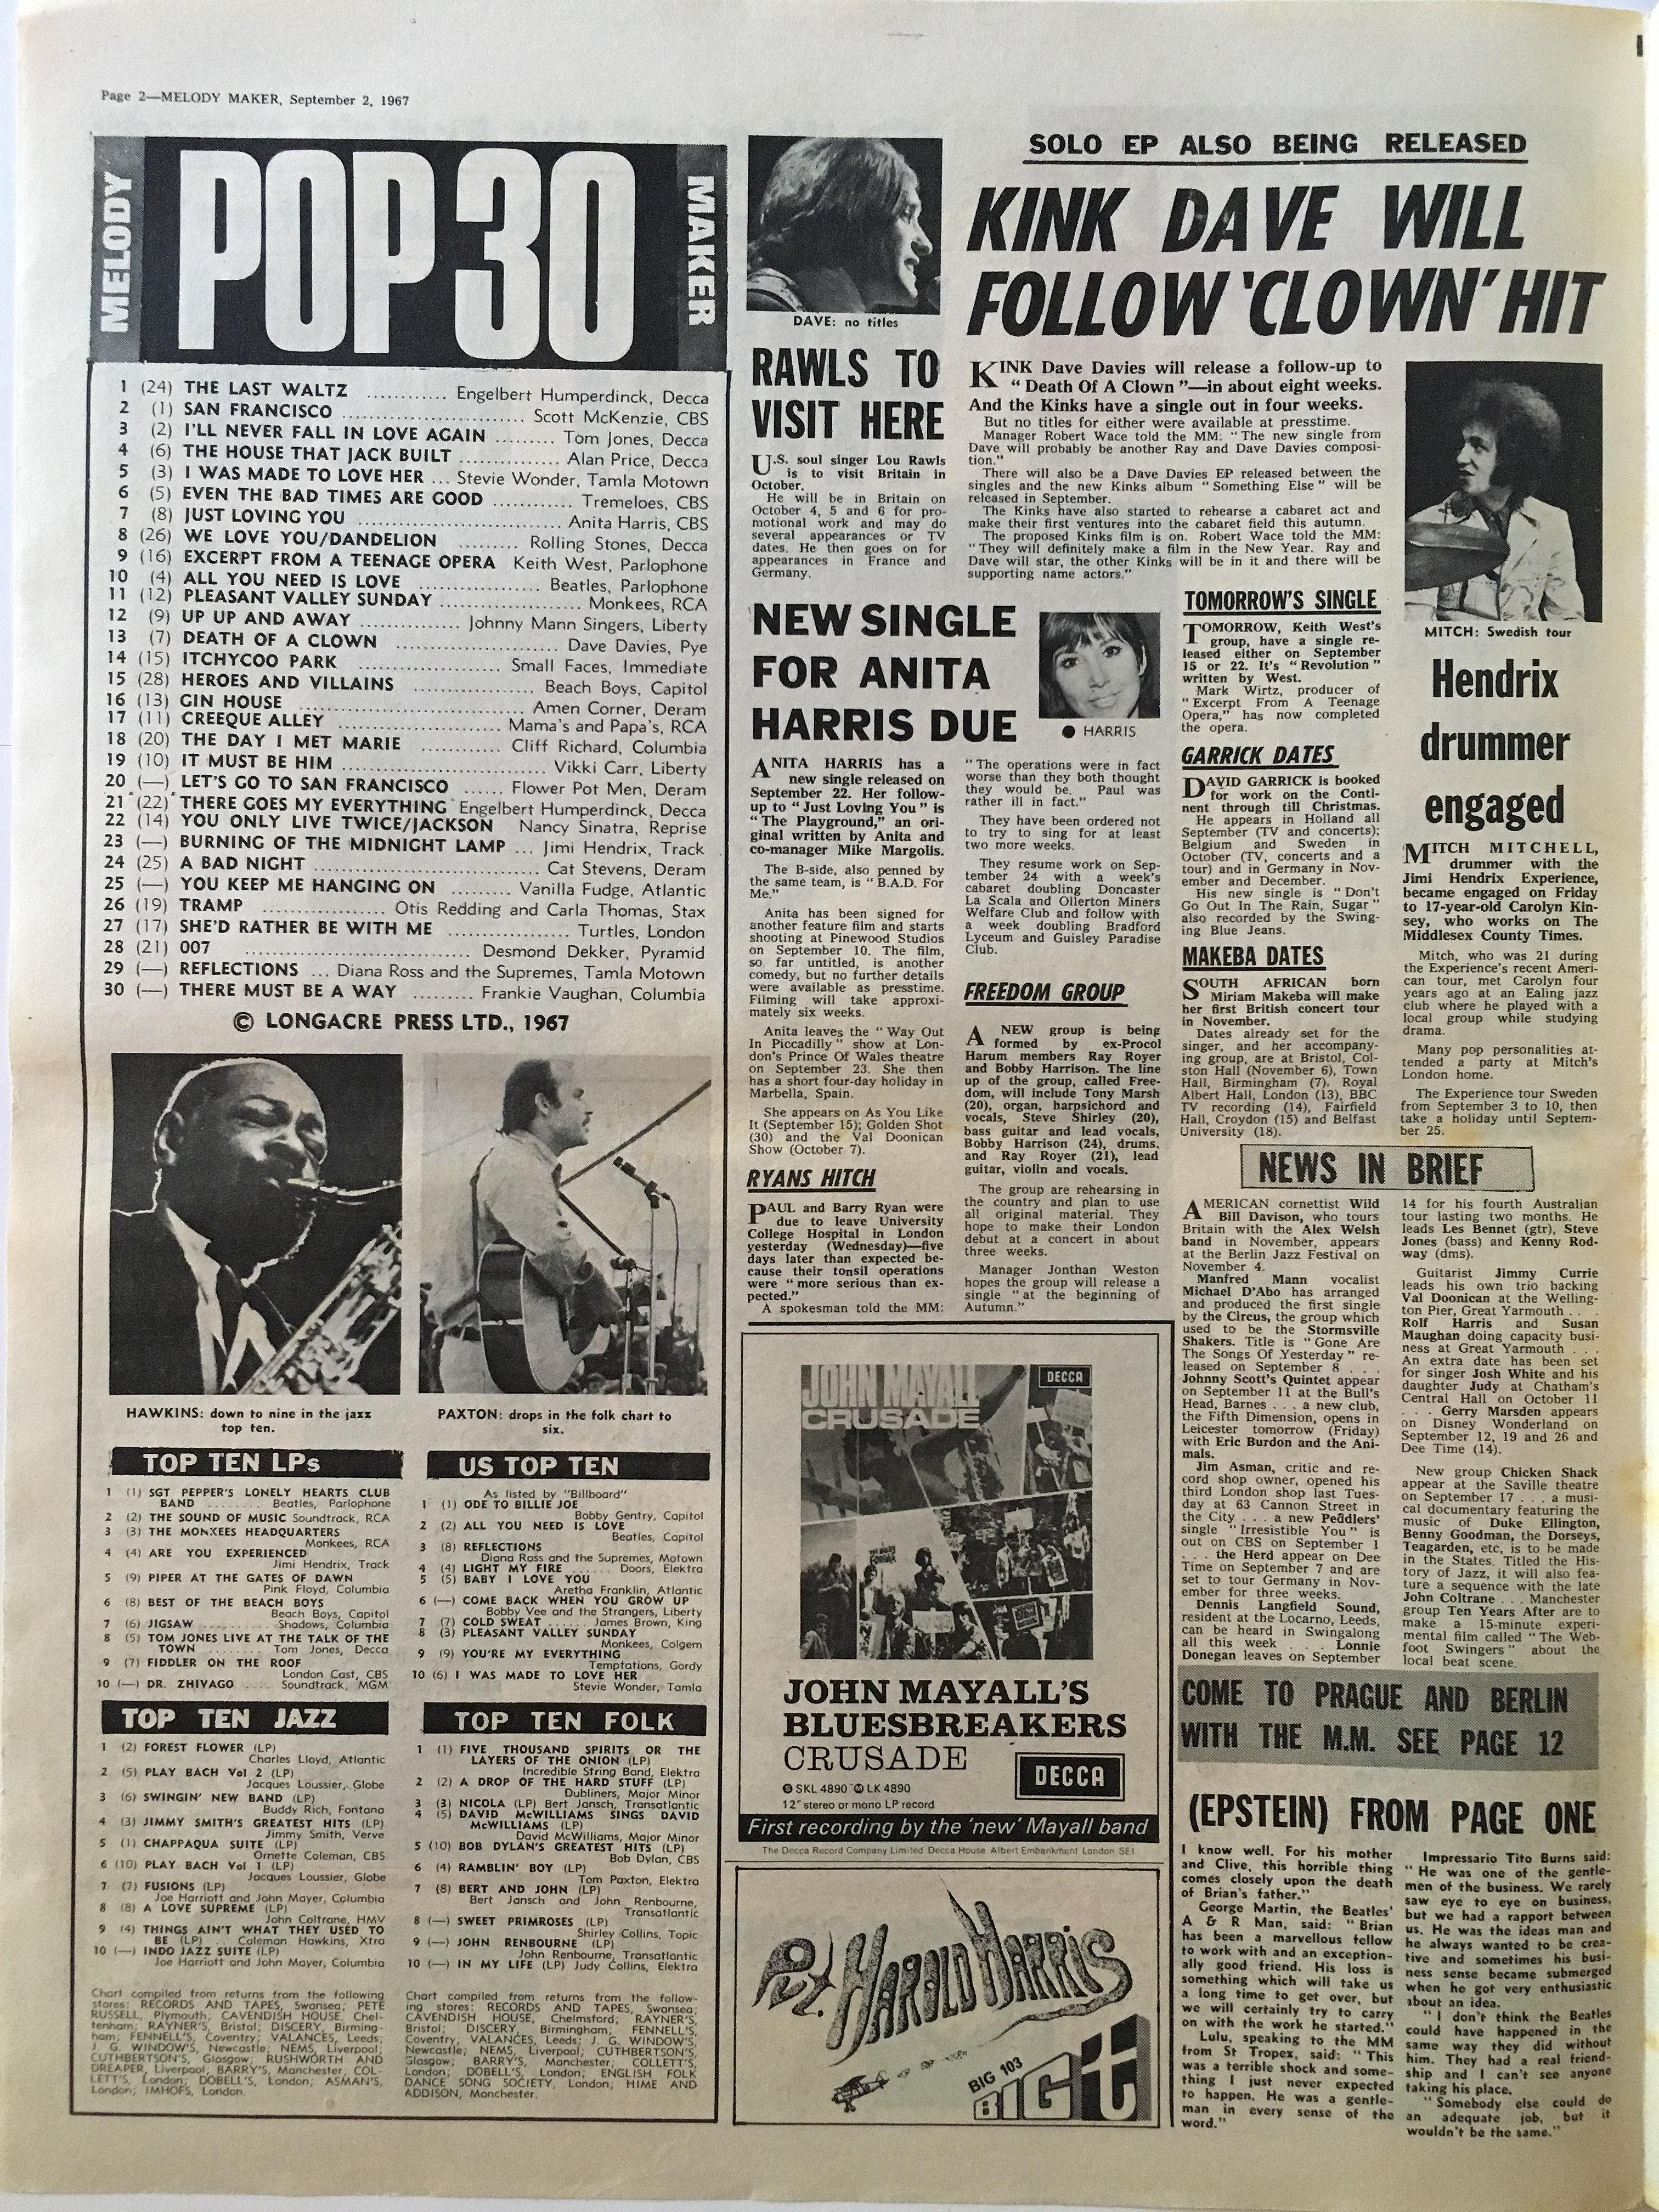 Jimi Hendrix Collector Newspaper/melody Maker/2/9/67 Pop 30/